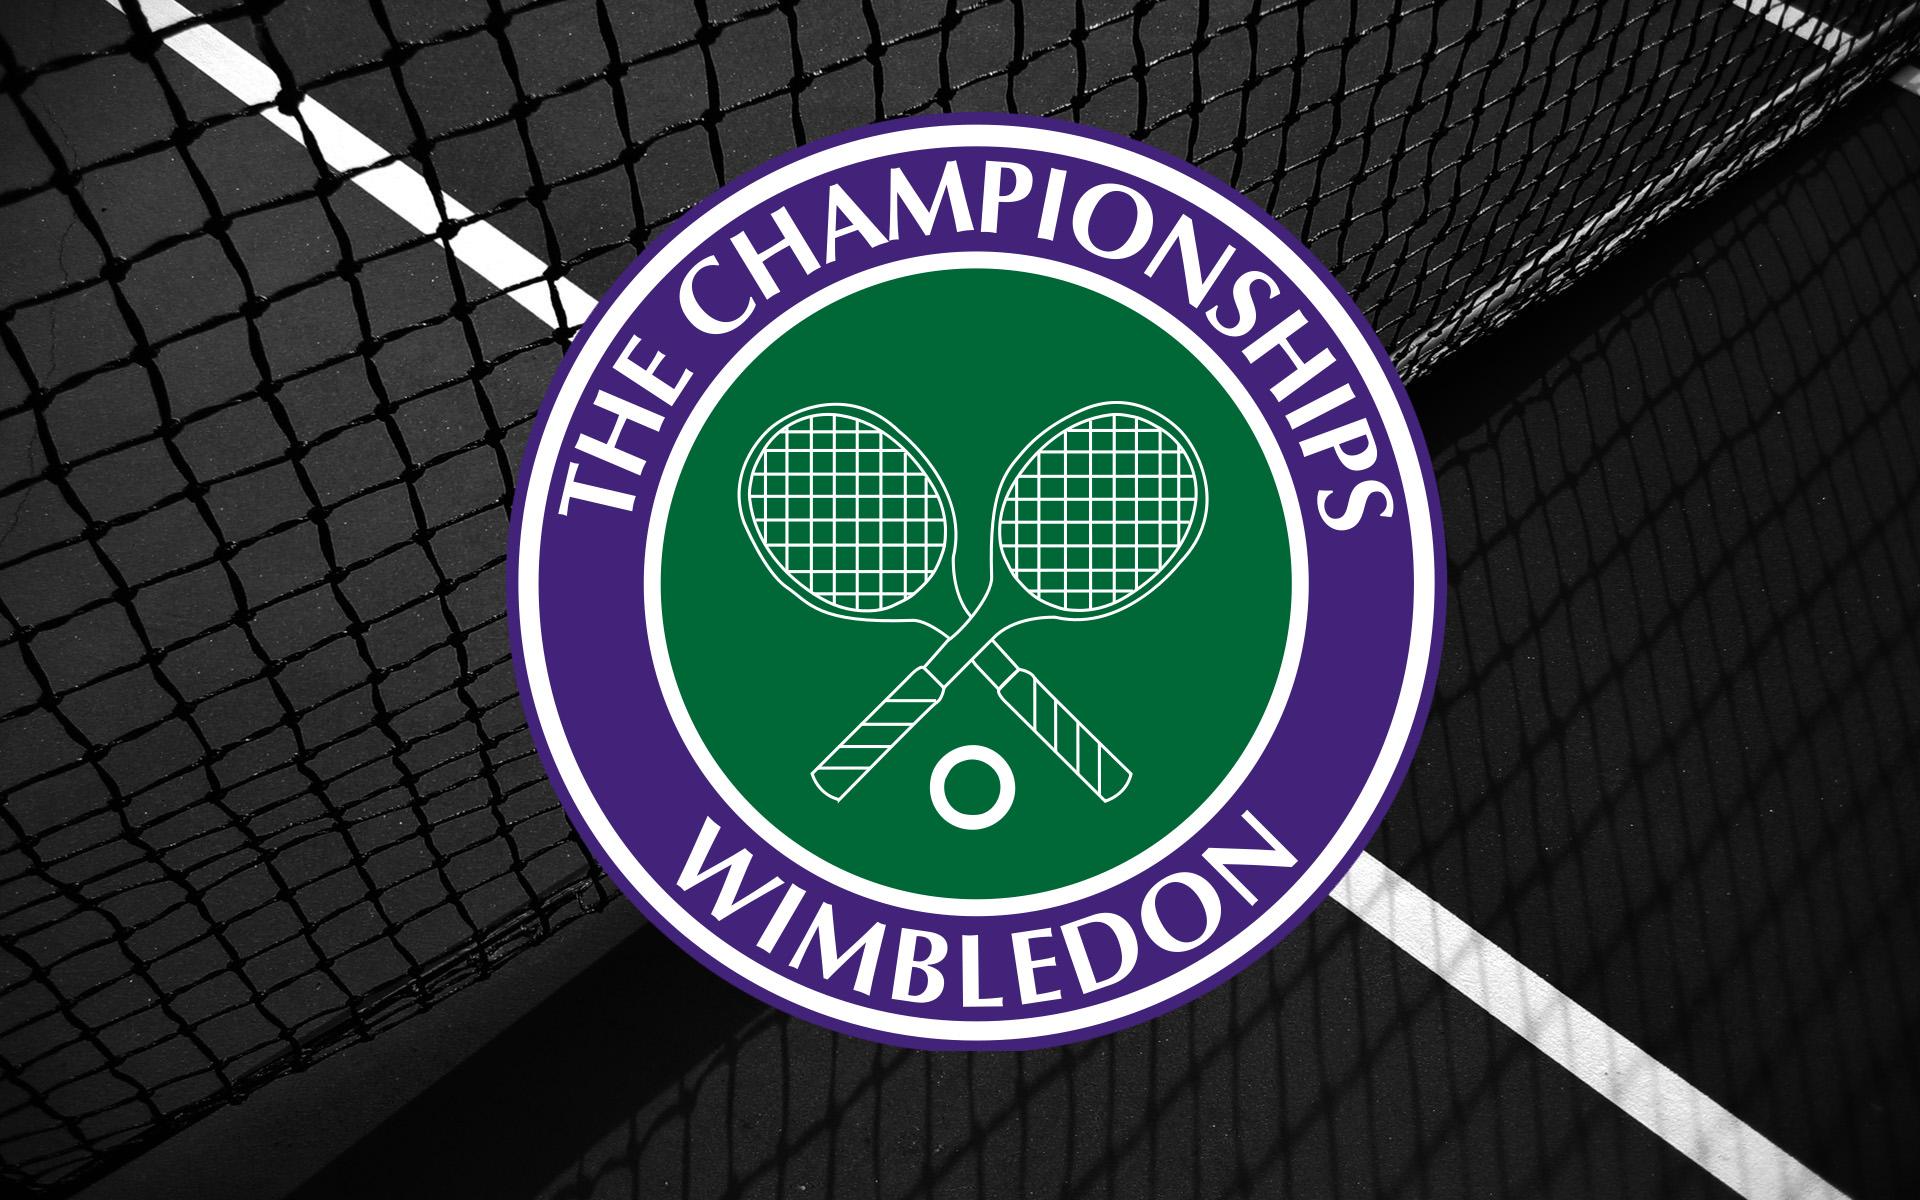 BILETUL ZILEI (04-07-2016) – Wimbledon – DOUBLE's TIPS